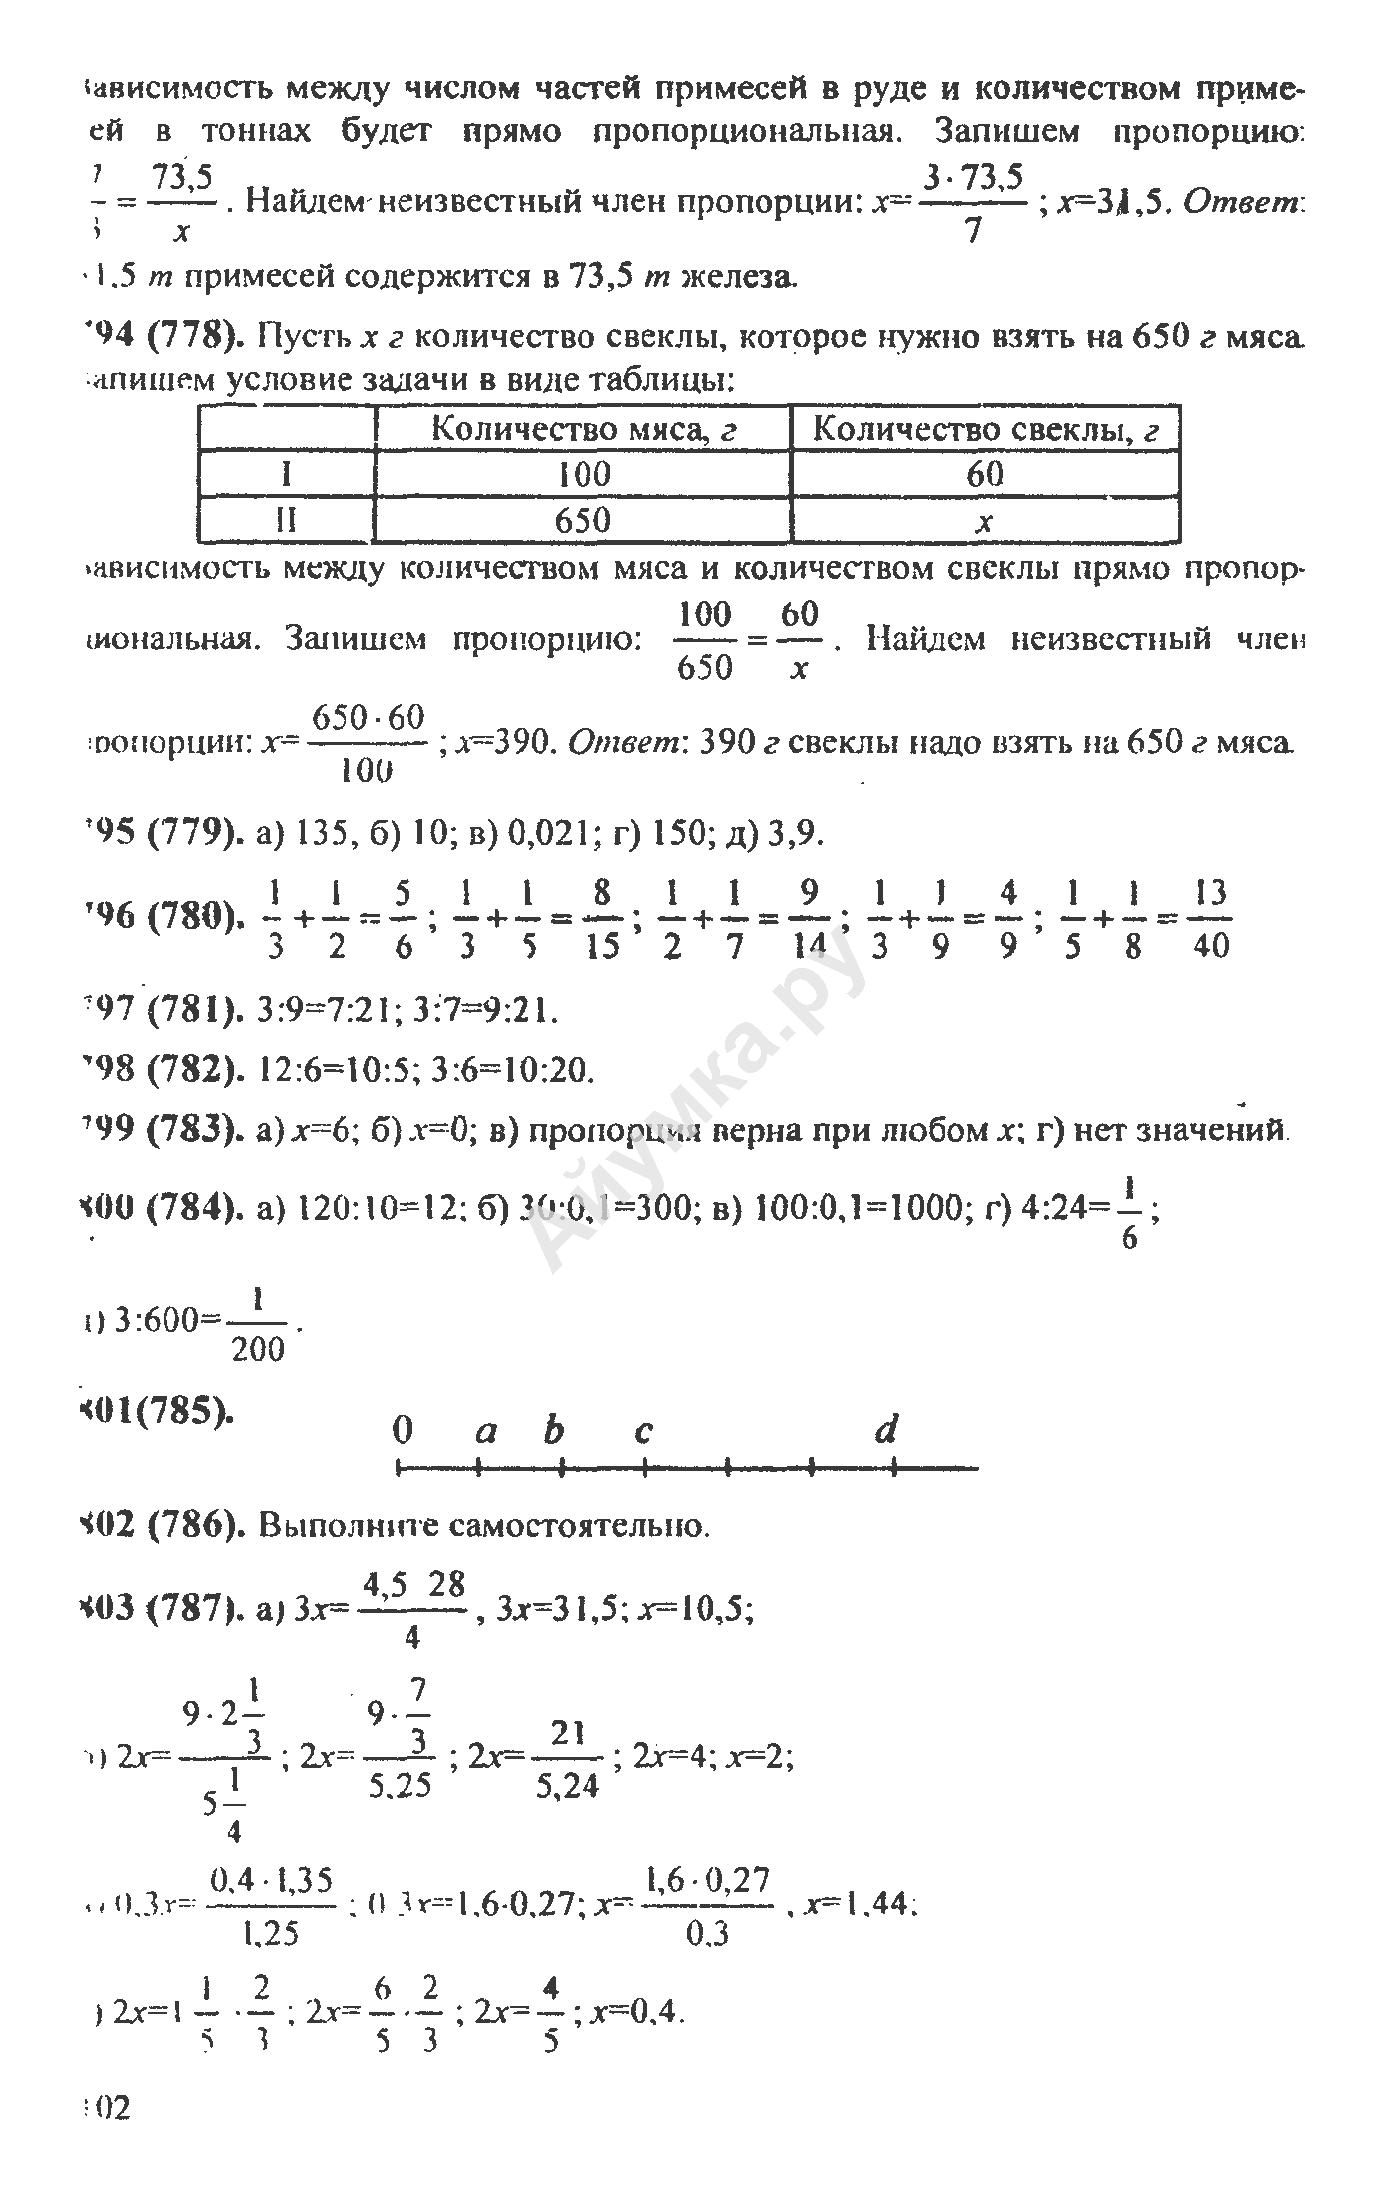 Гдз 9 класс онлайн русский язык заметка